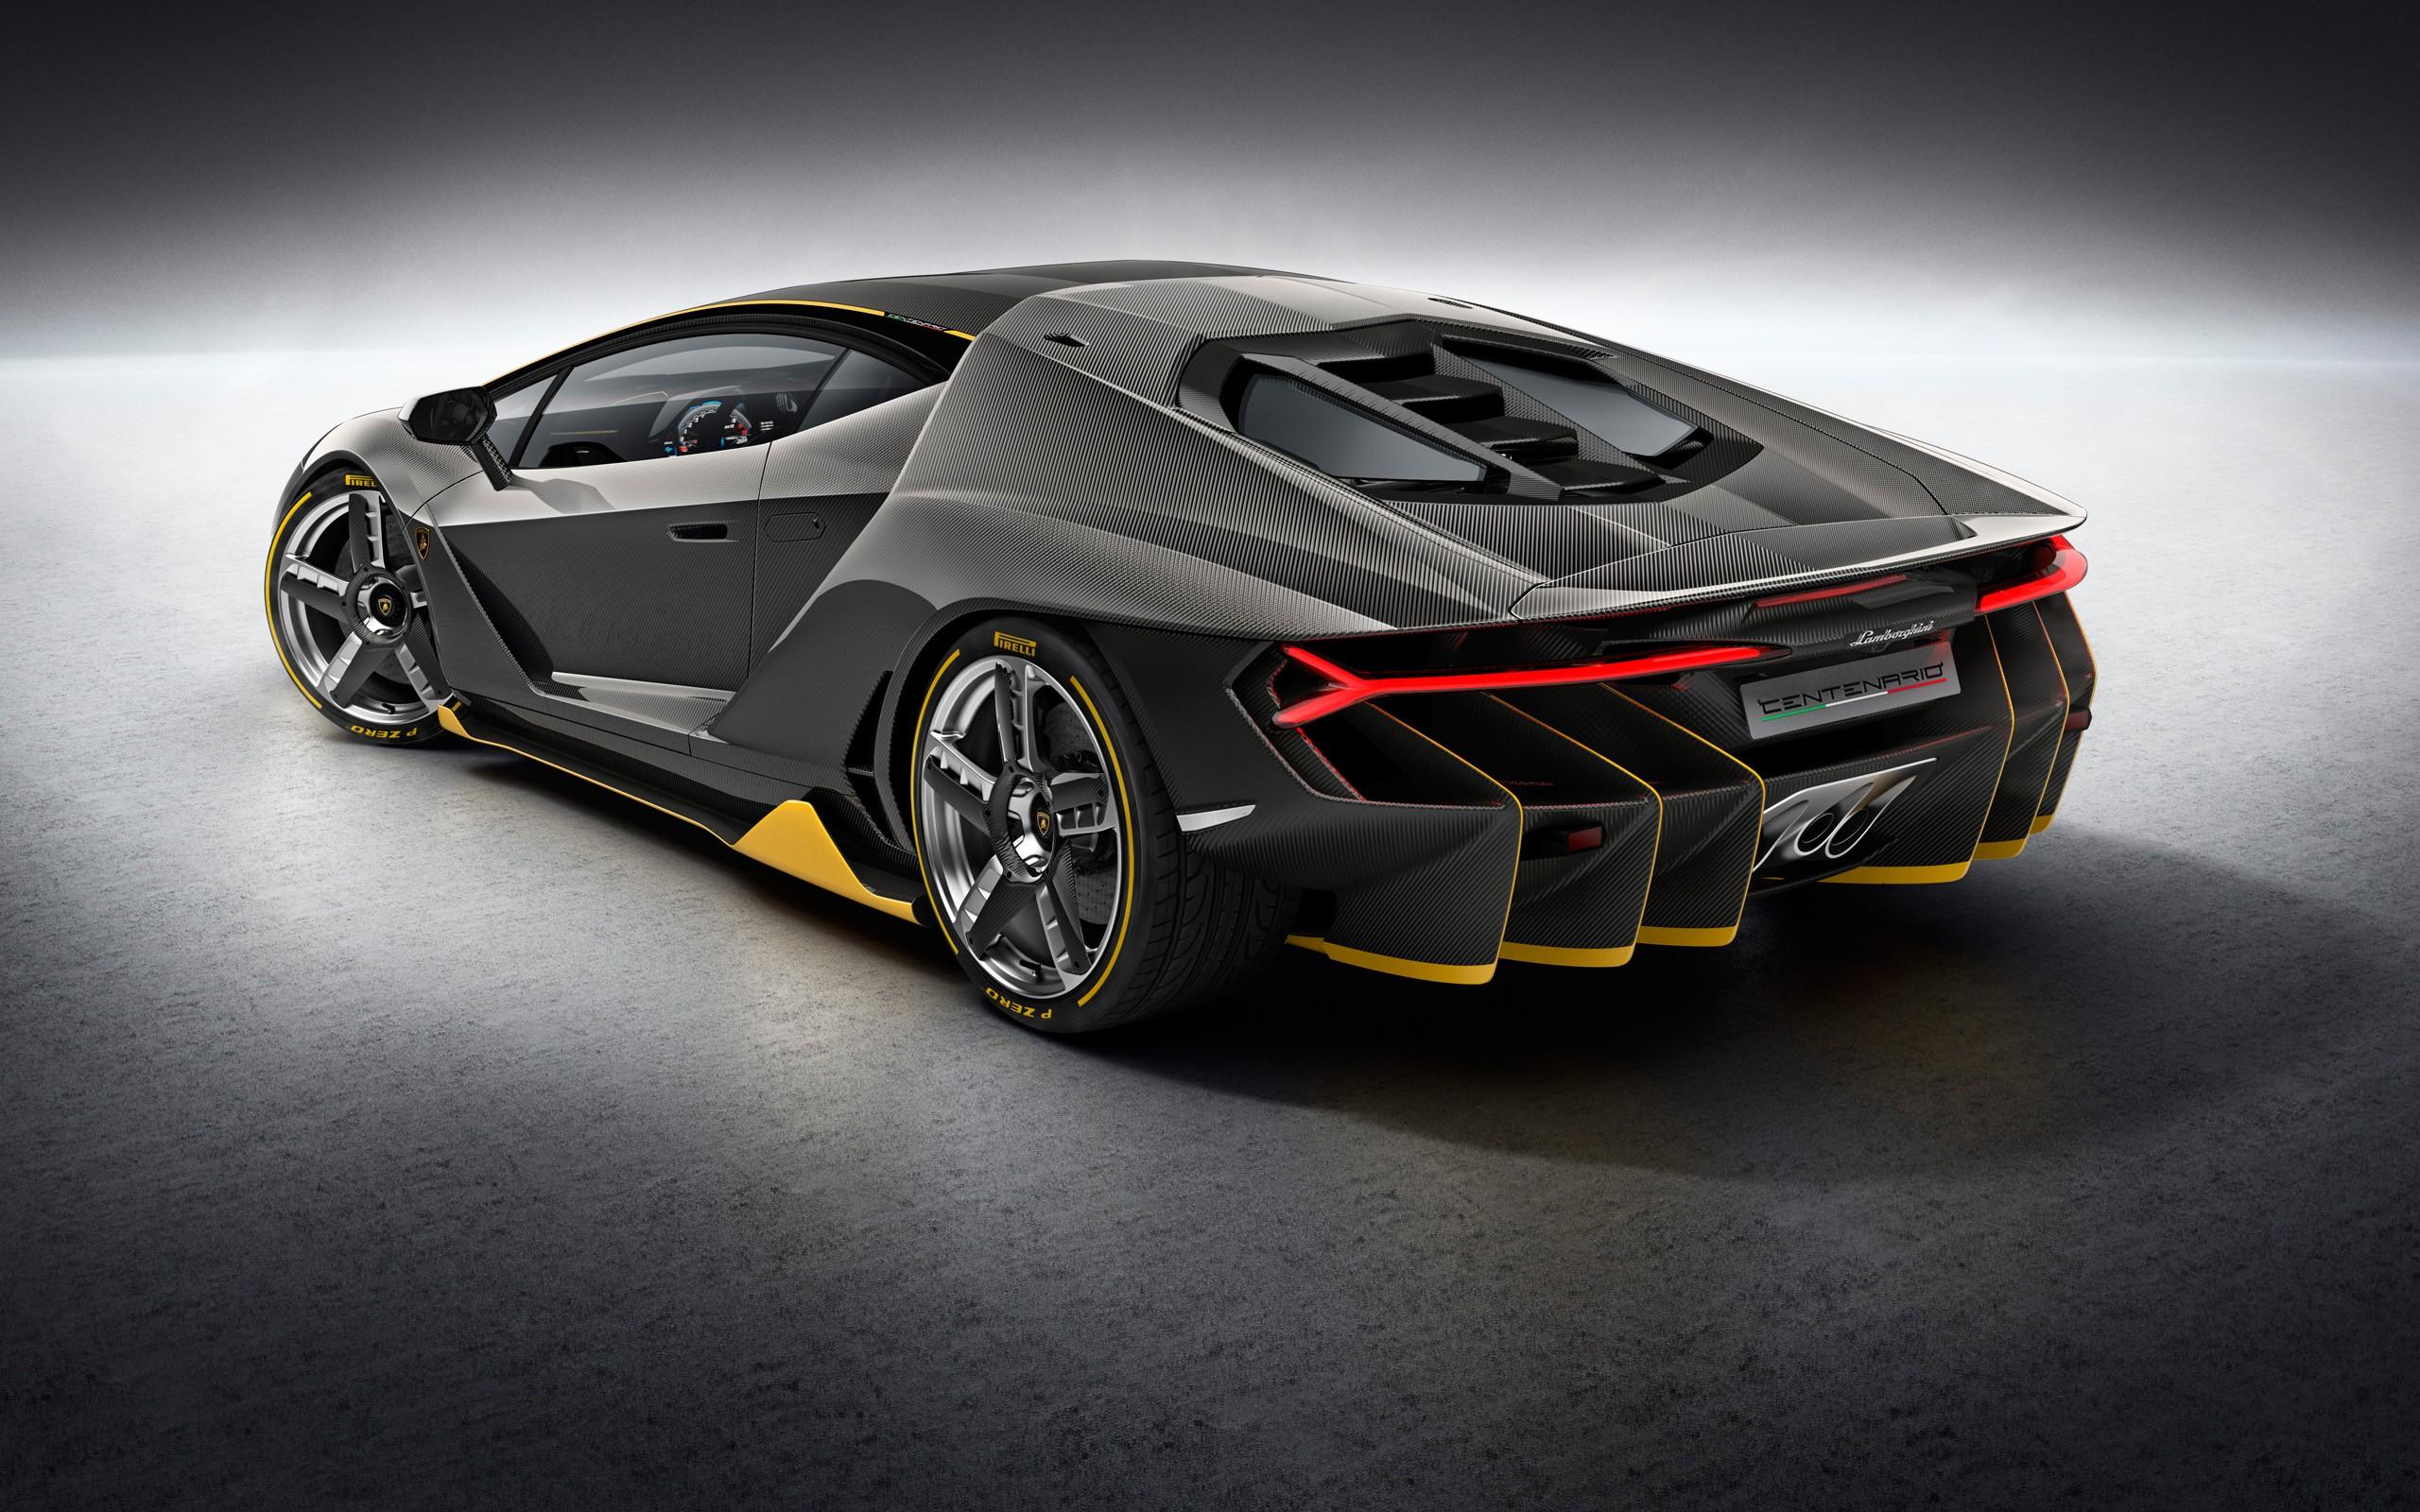 2016 Land Rover >> 2016 Lamborghini Centenario LP 770 4 4 Wallpaper | HD Car Wallpapers | ID #6259